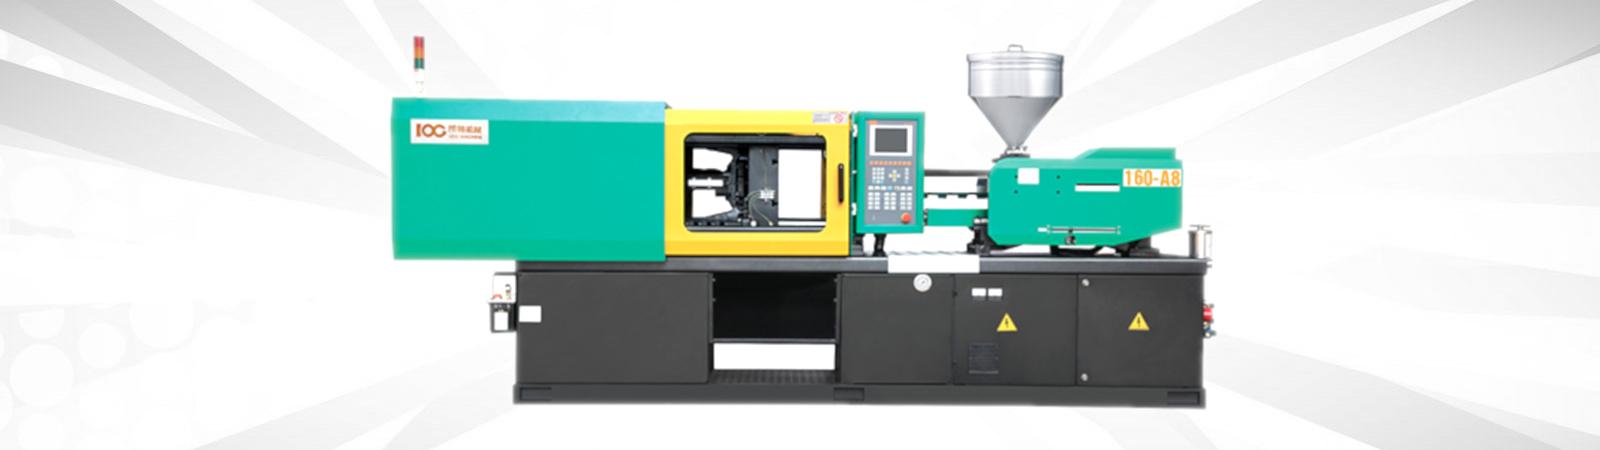 Slide 16 - LOG MACHINE